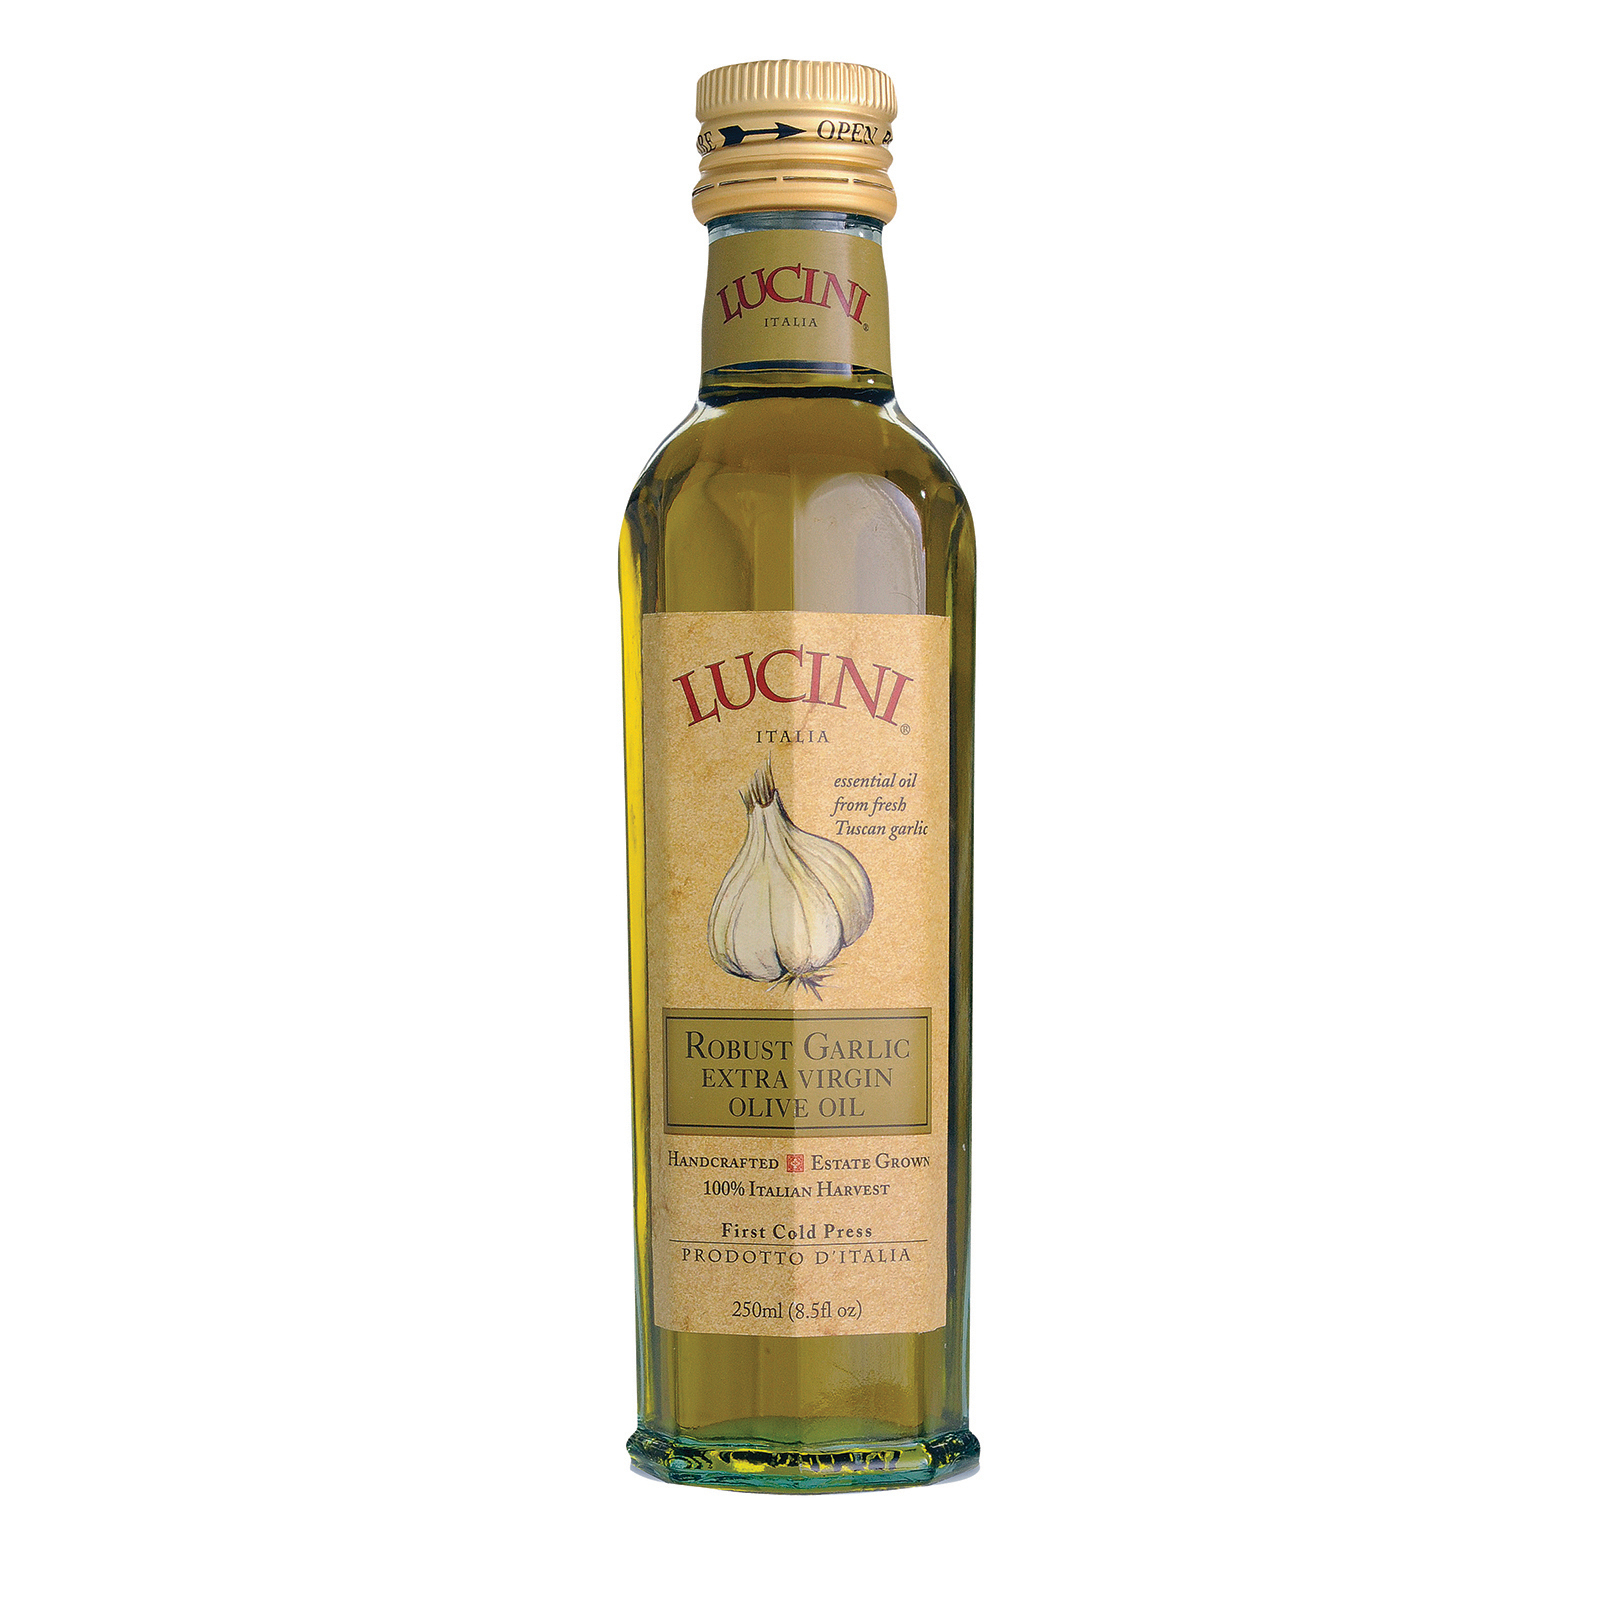 Lucini Italia Robust Garlic Extra Virgin Olive Oil - Case of 6 - 8.5 Fl oz.